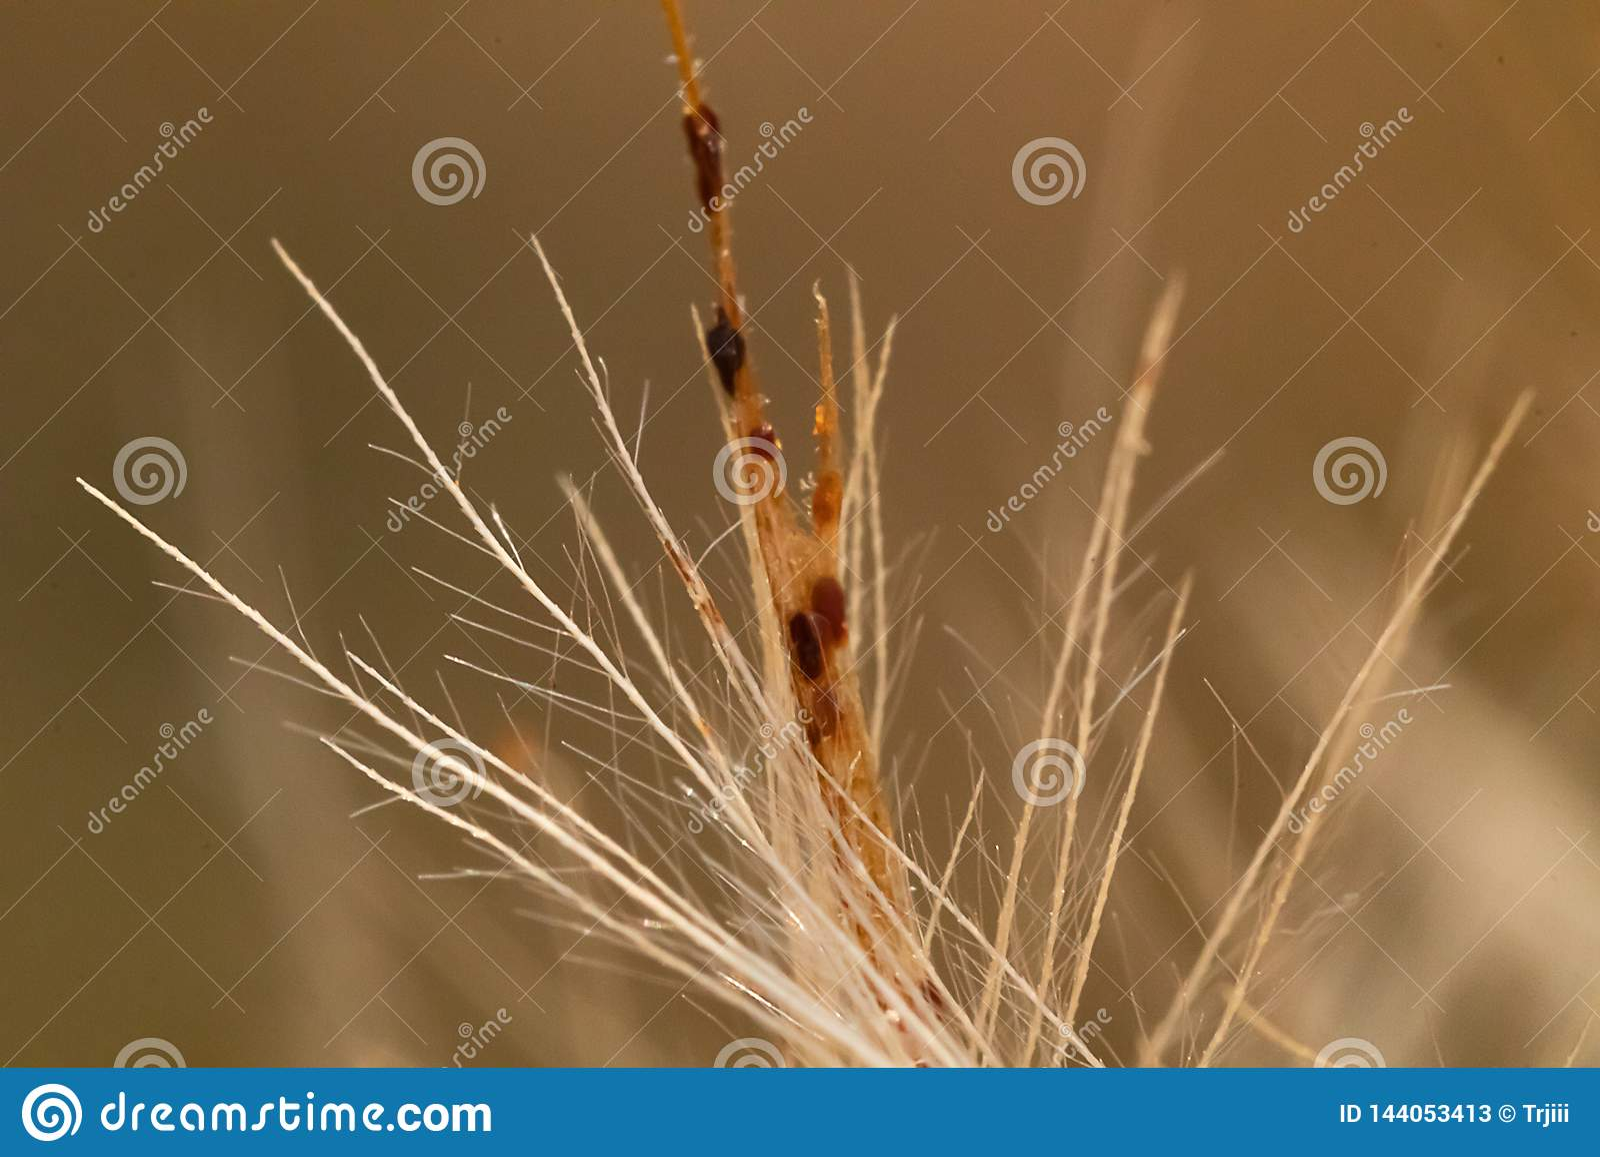 Brown beige stiff multi-branched twig